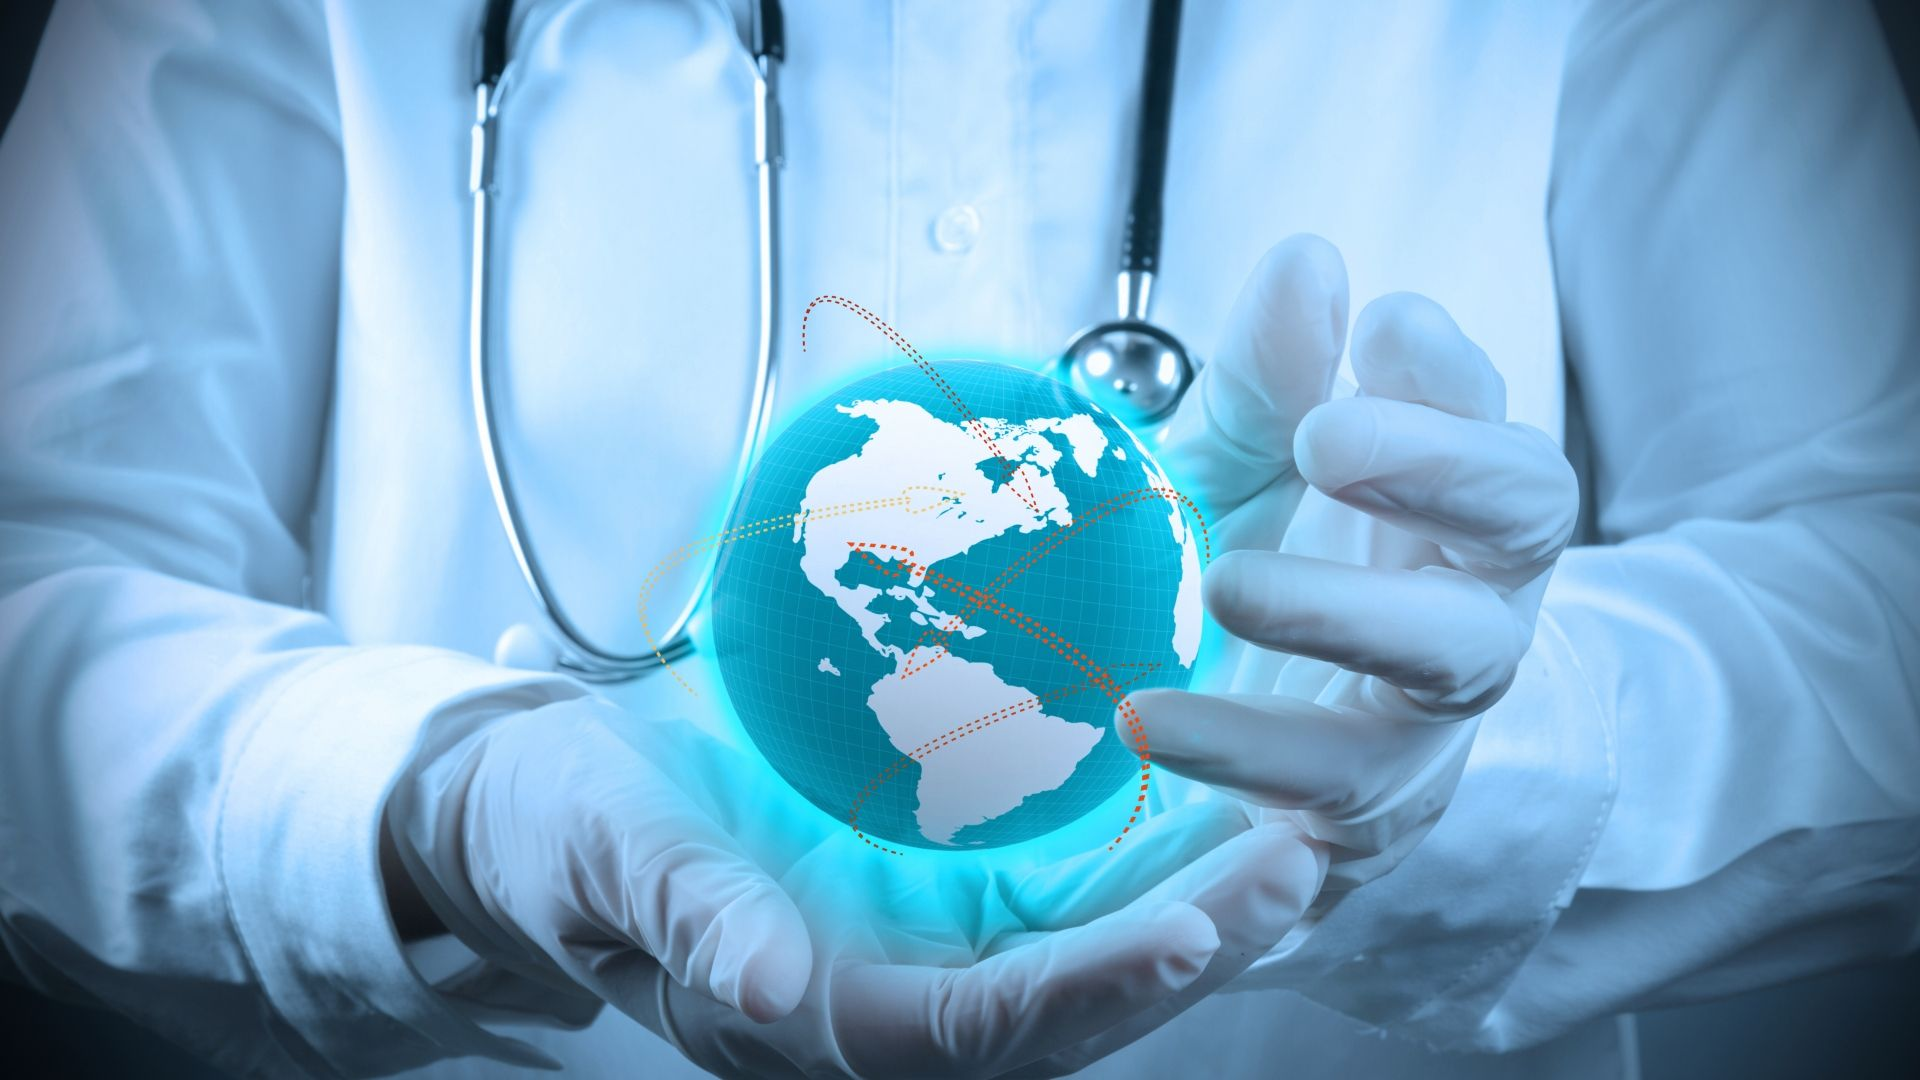 Medical Download Wallpaper